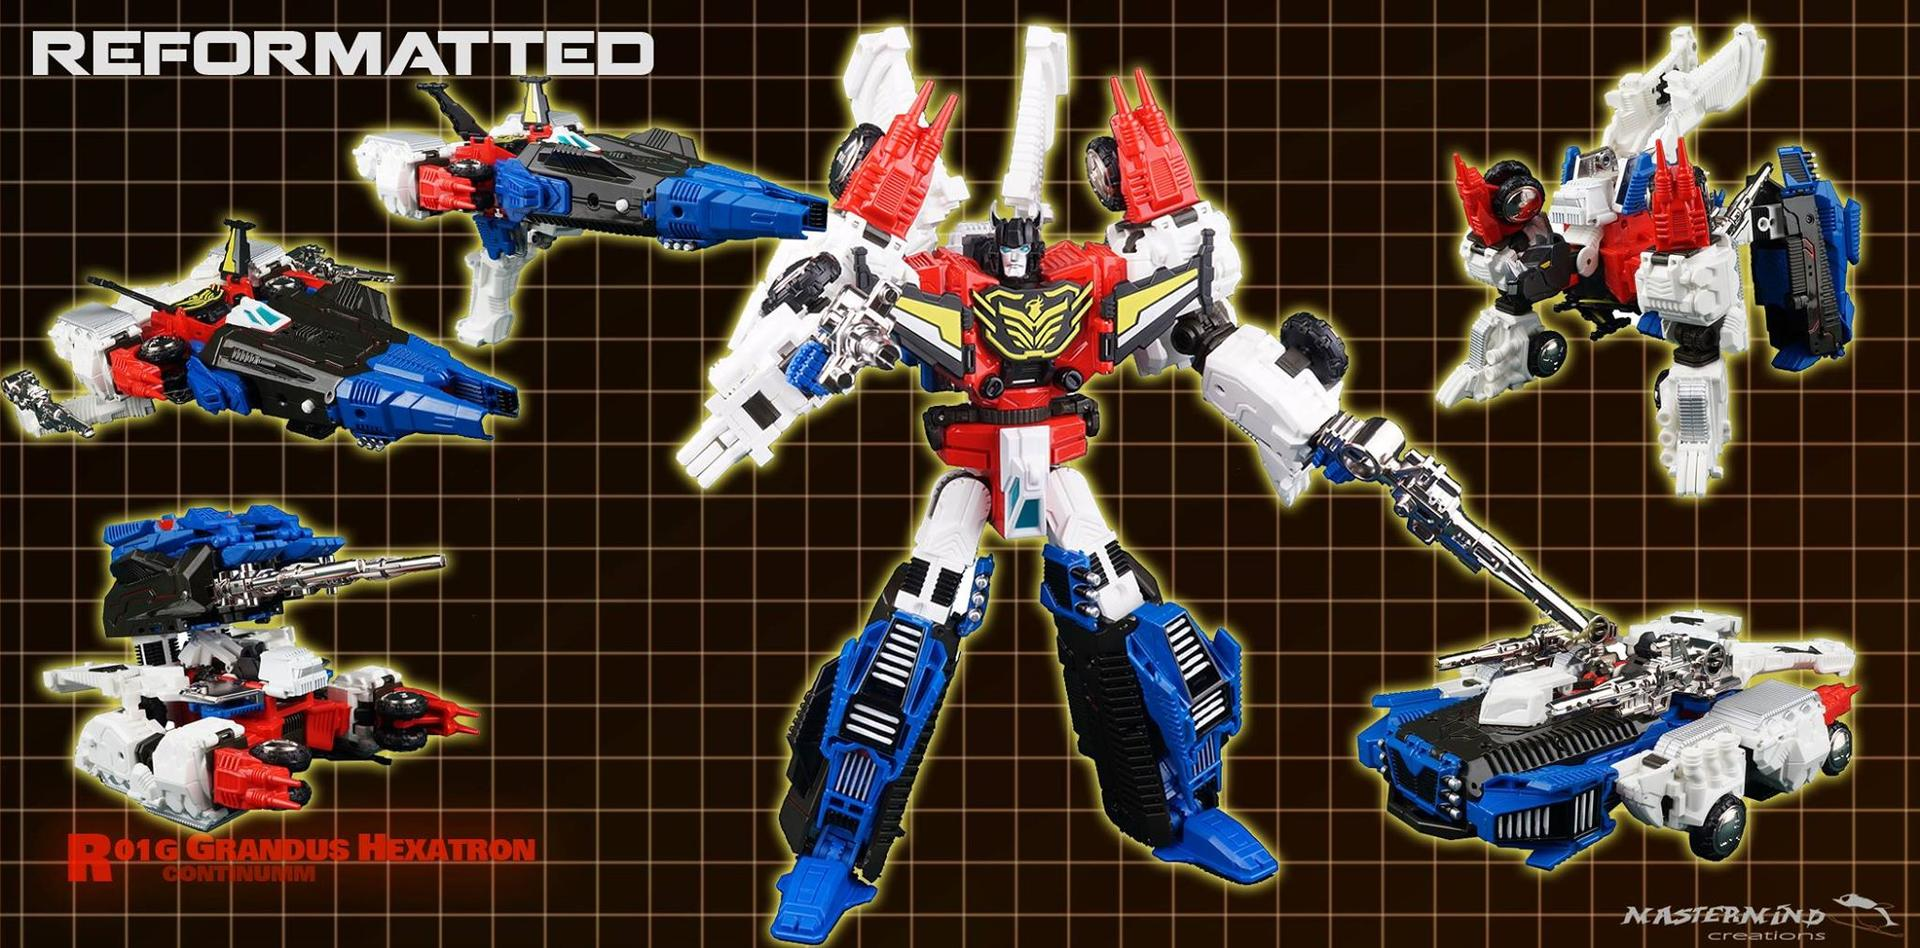 [Masterpiece Tiers] MMC R-01G GRANDUS HEXATRON aka GREATSHOT - Sortie Novembre 2015 Vu9G6aLe